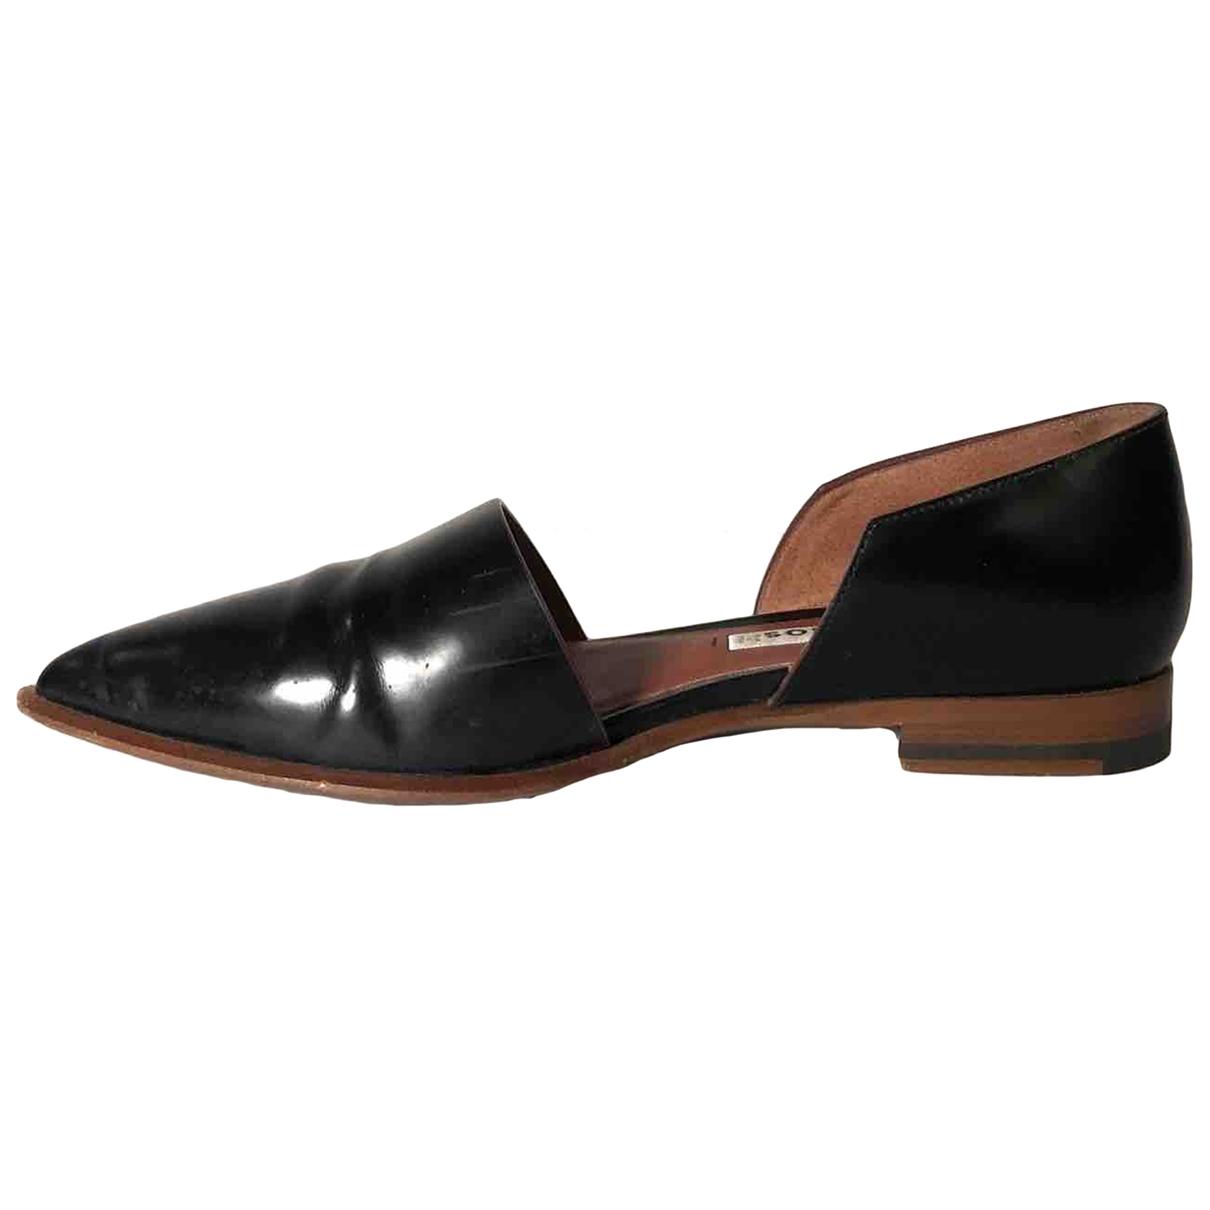 Acne Studios \N Black Leather Sandals for Women 37 EU